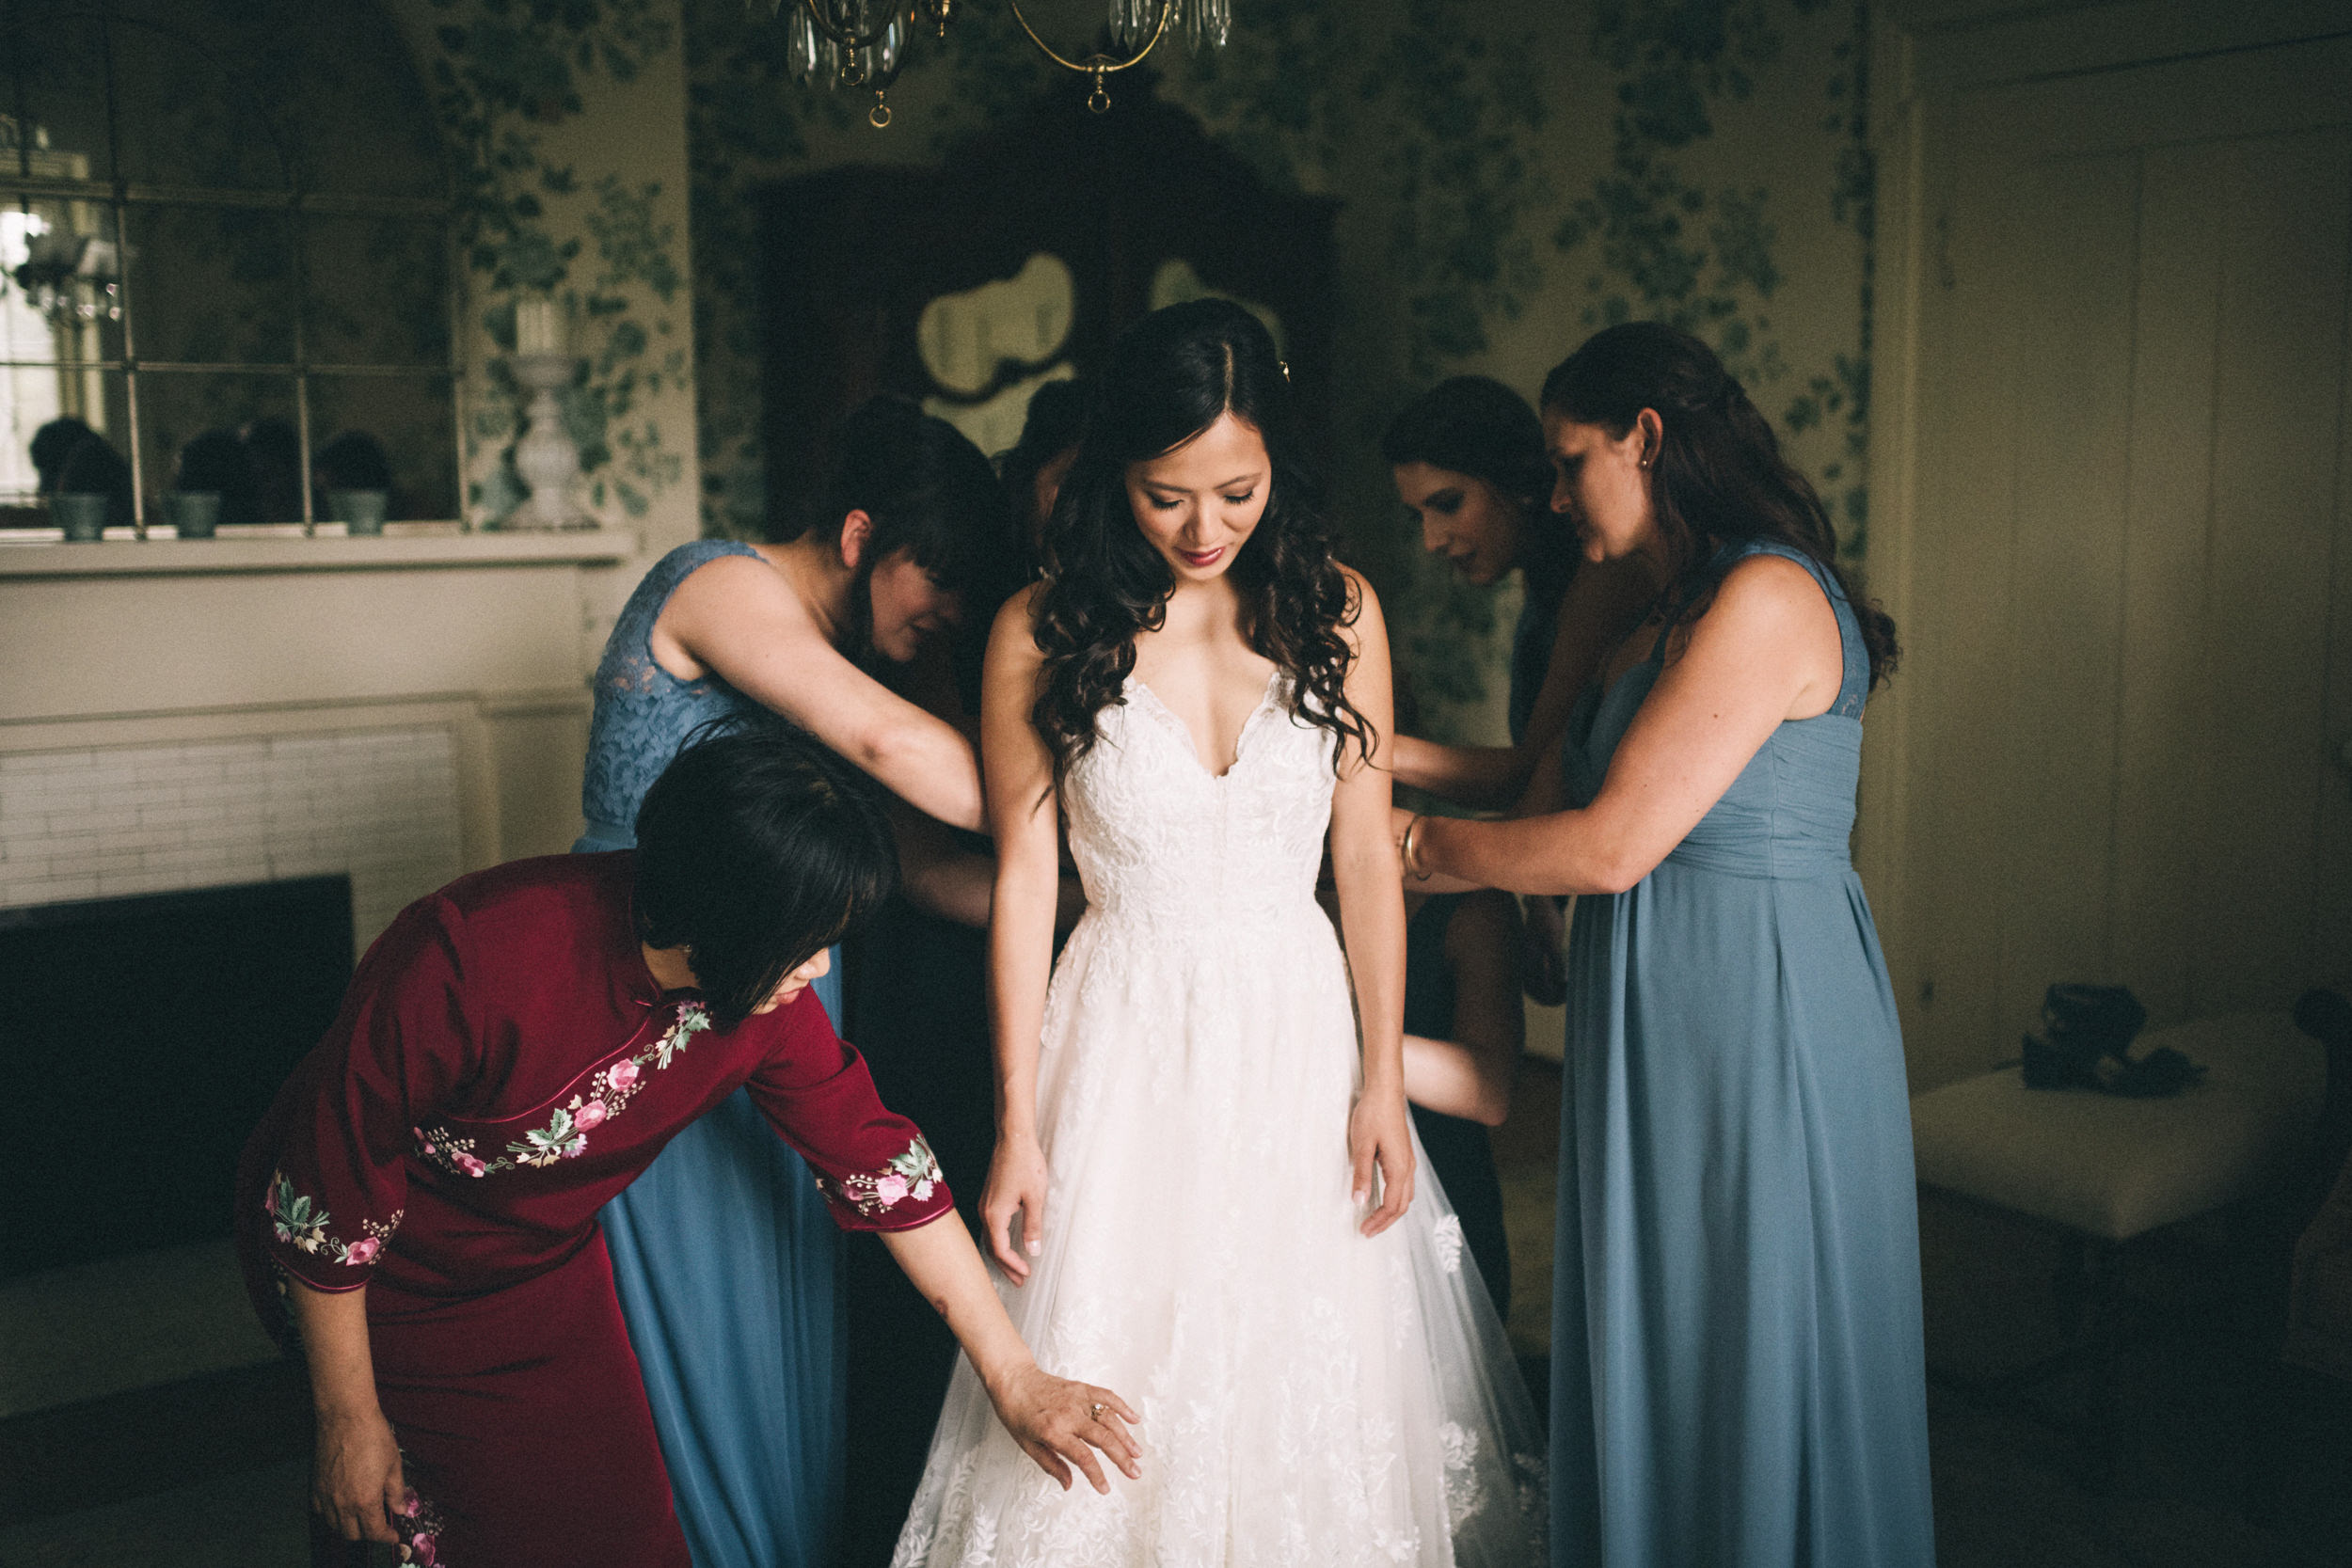 Louisville-Kentucky-Wedding-and-Elopement-Photographer-Sarah-Katherine-Davis-Photography-Summer-Jewel-Toned-Wedding-Chineese-Tea-Ceremony-Warrenwood-Manor-Danville-81.jpg